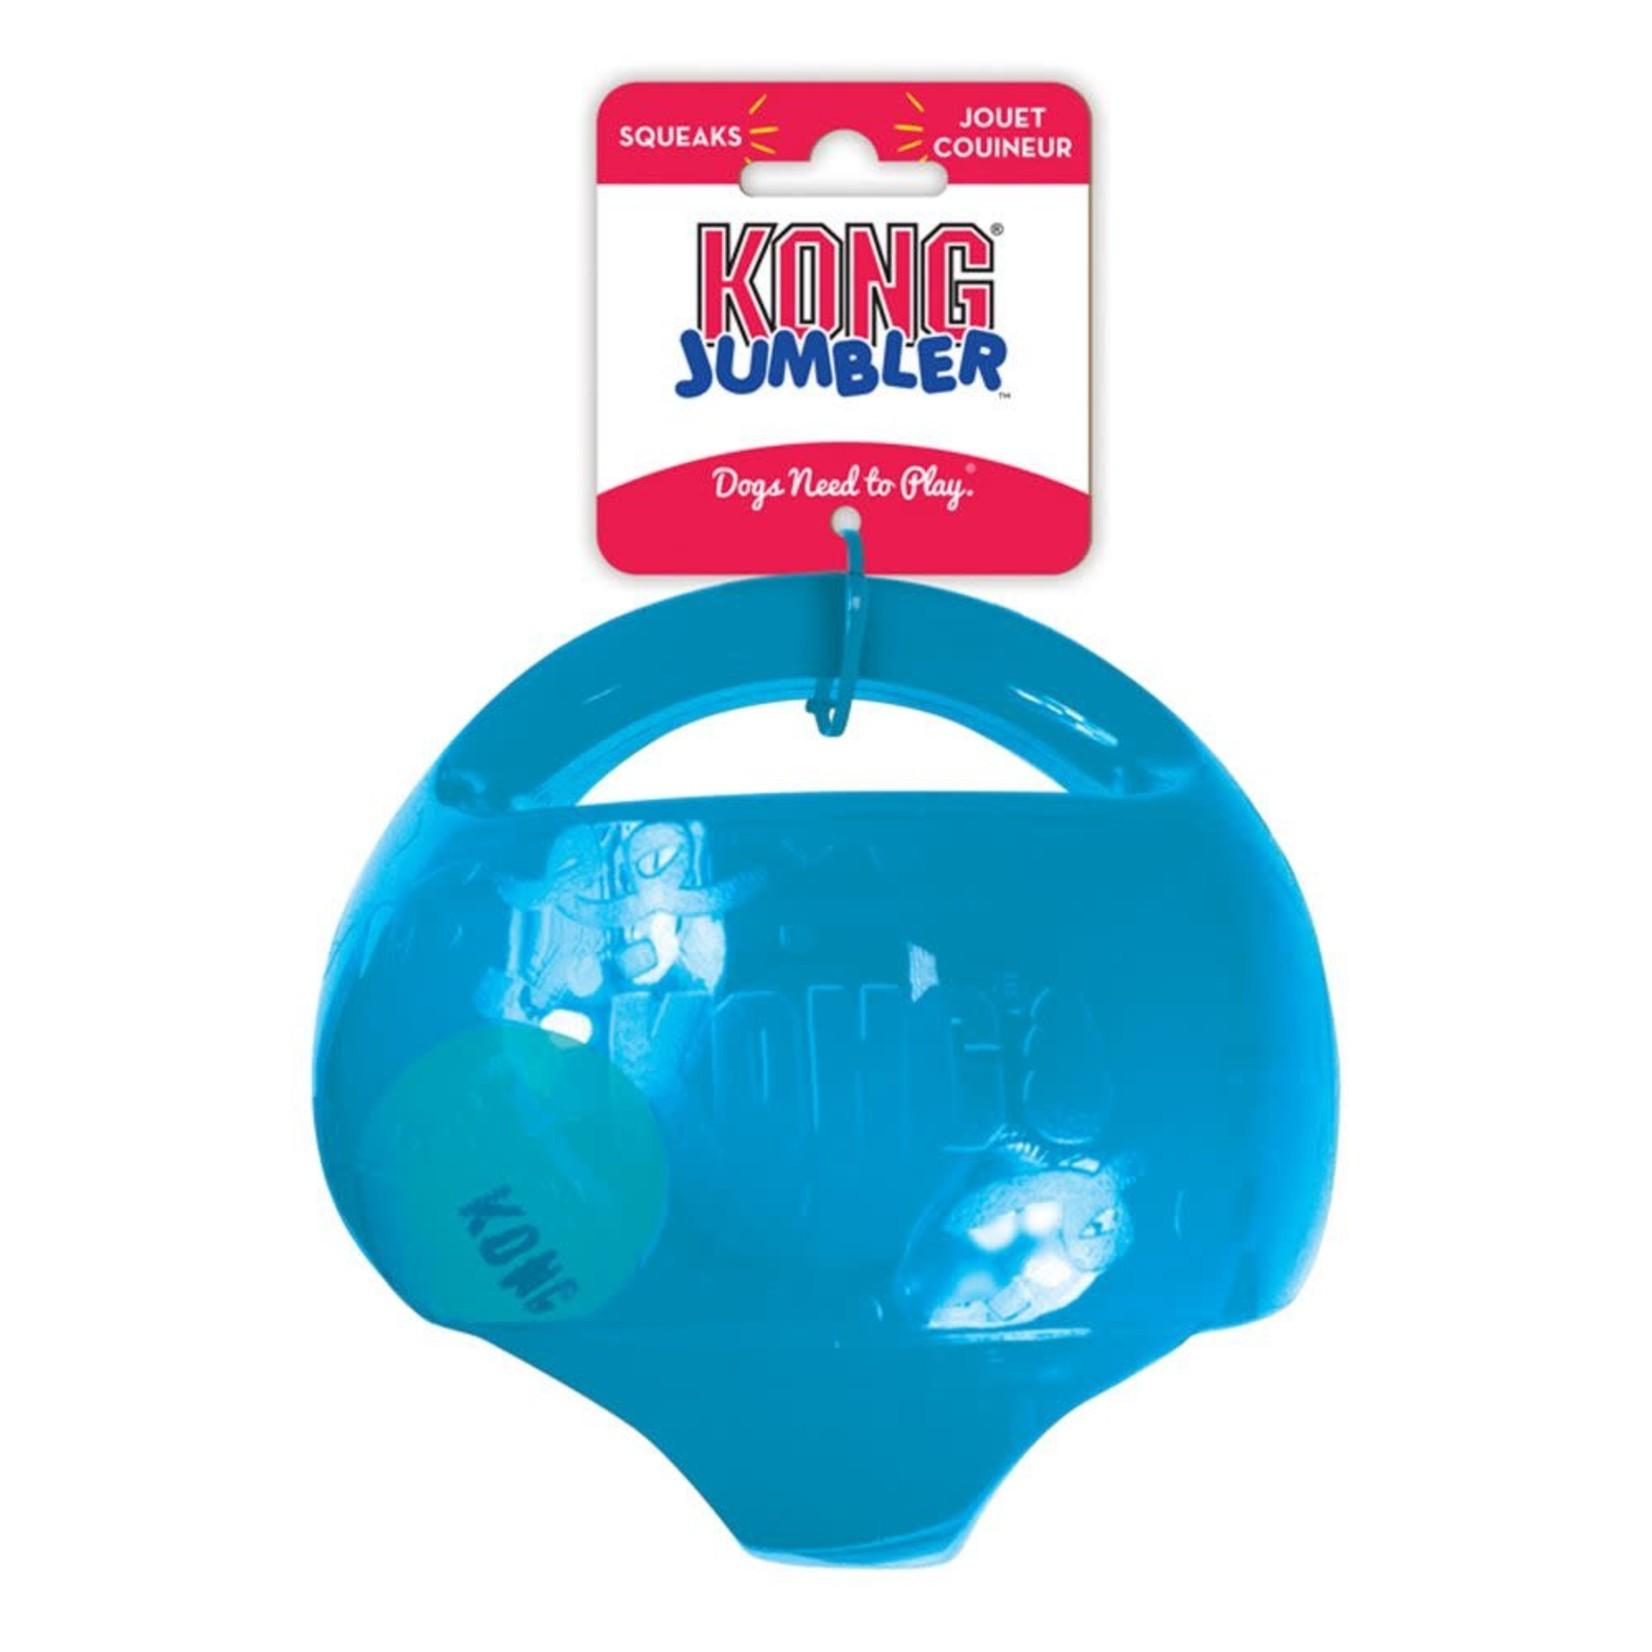 Kong Kong Jumbler ball L-XL Dog Toy